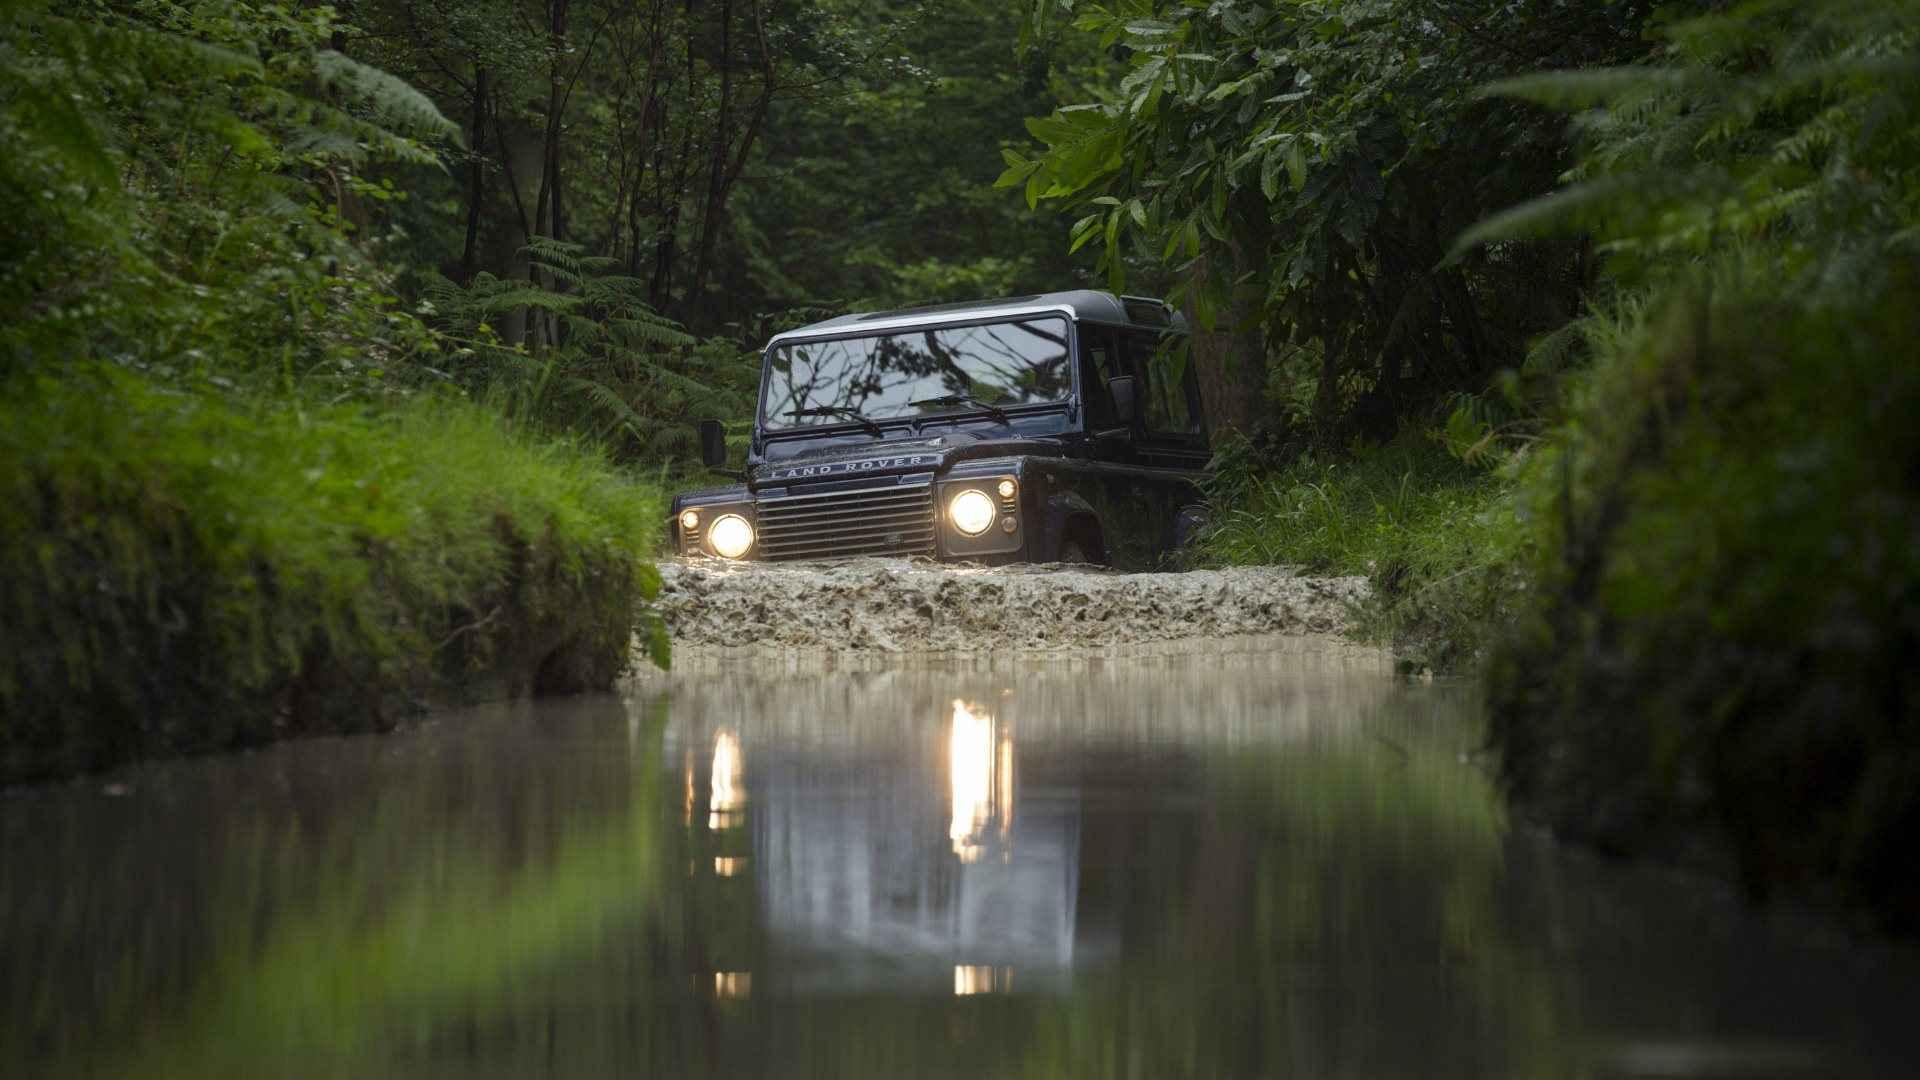 http://1.bp.blogspot.com/-pg4mcw11PG0/UFaguwyFA0I/AAAAAAAALNc/SmVjbZ3Qymw/s1920/land-rover-defender-off-road-wallpaper-4.jpg